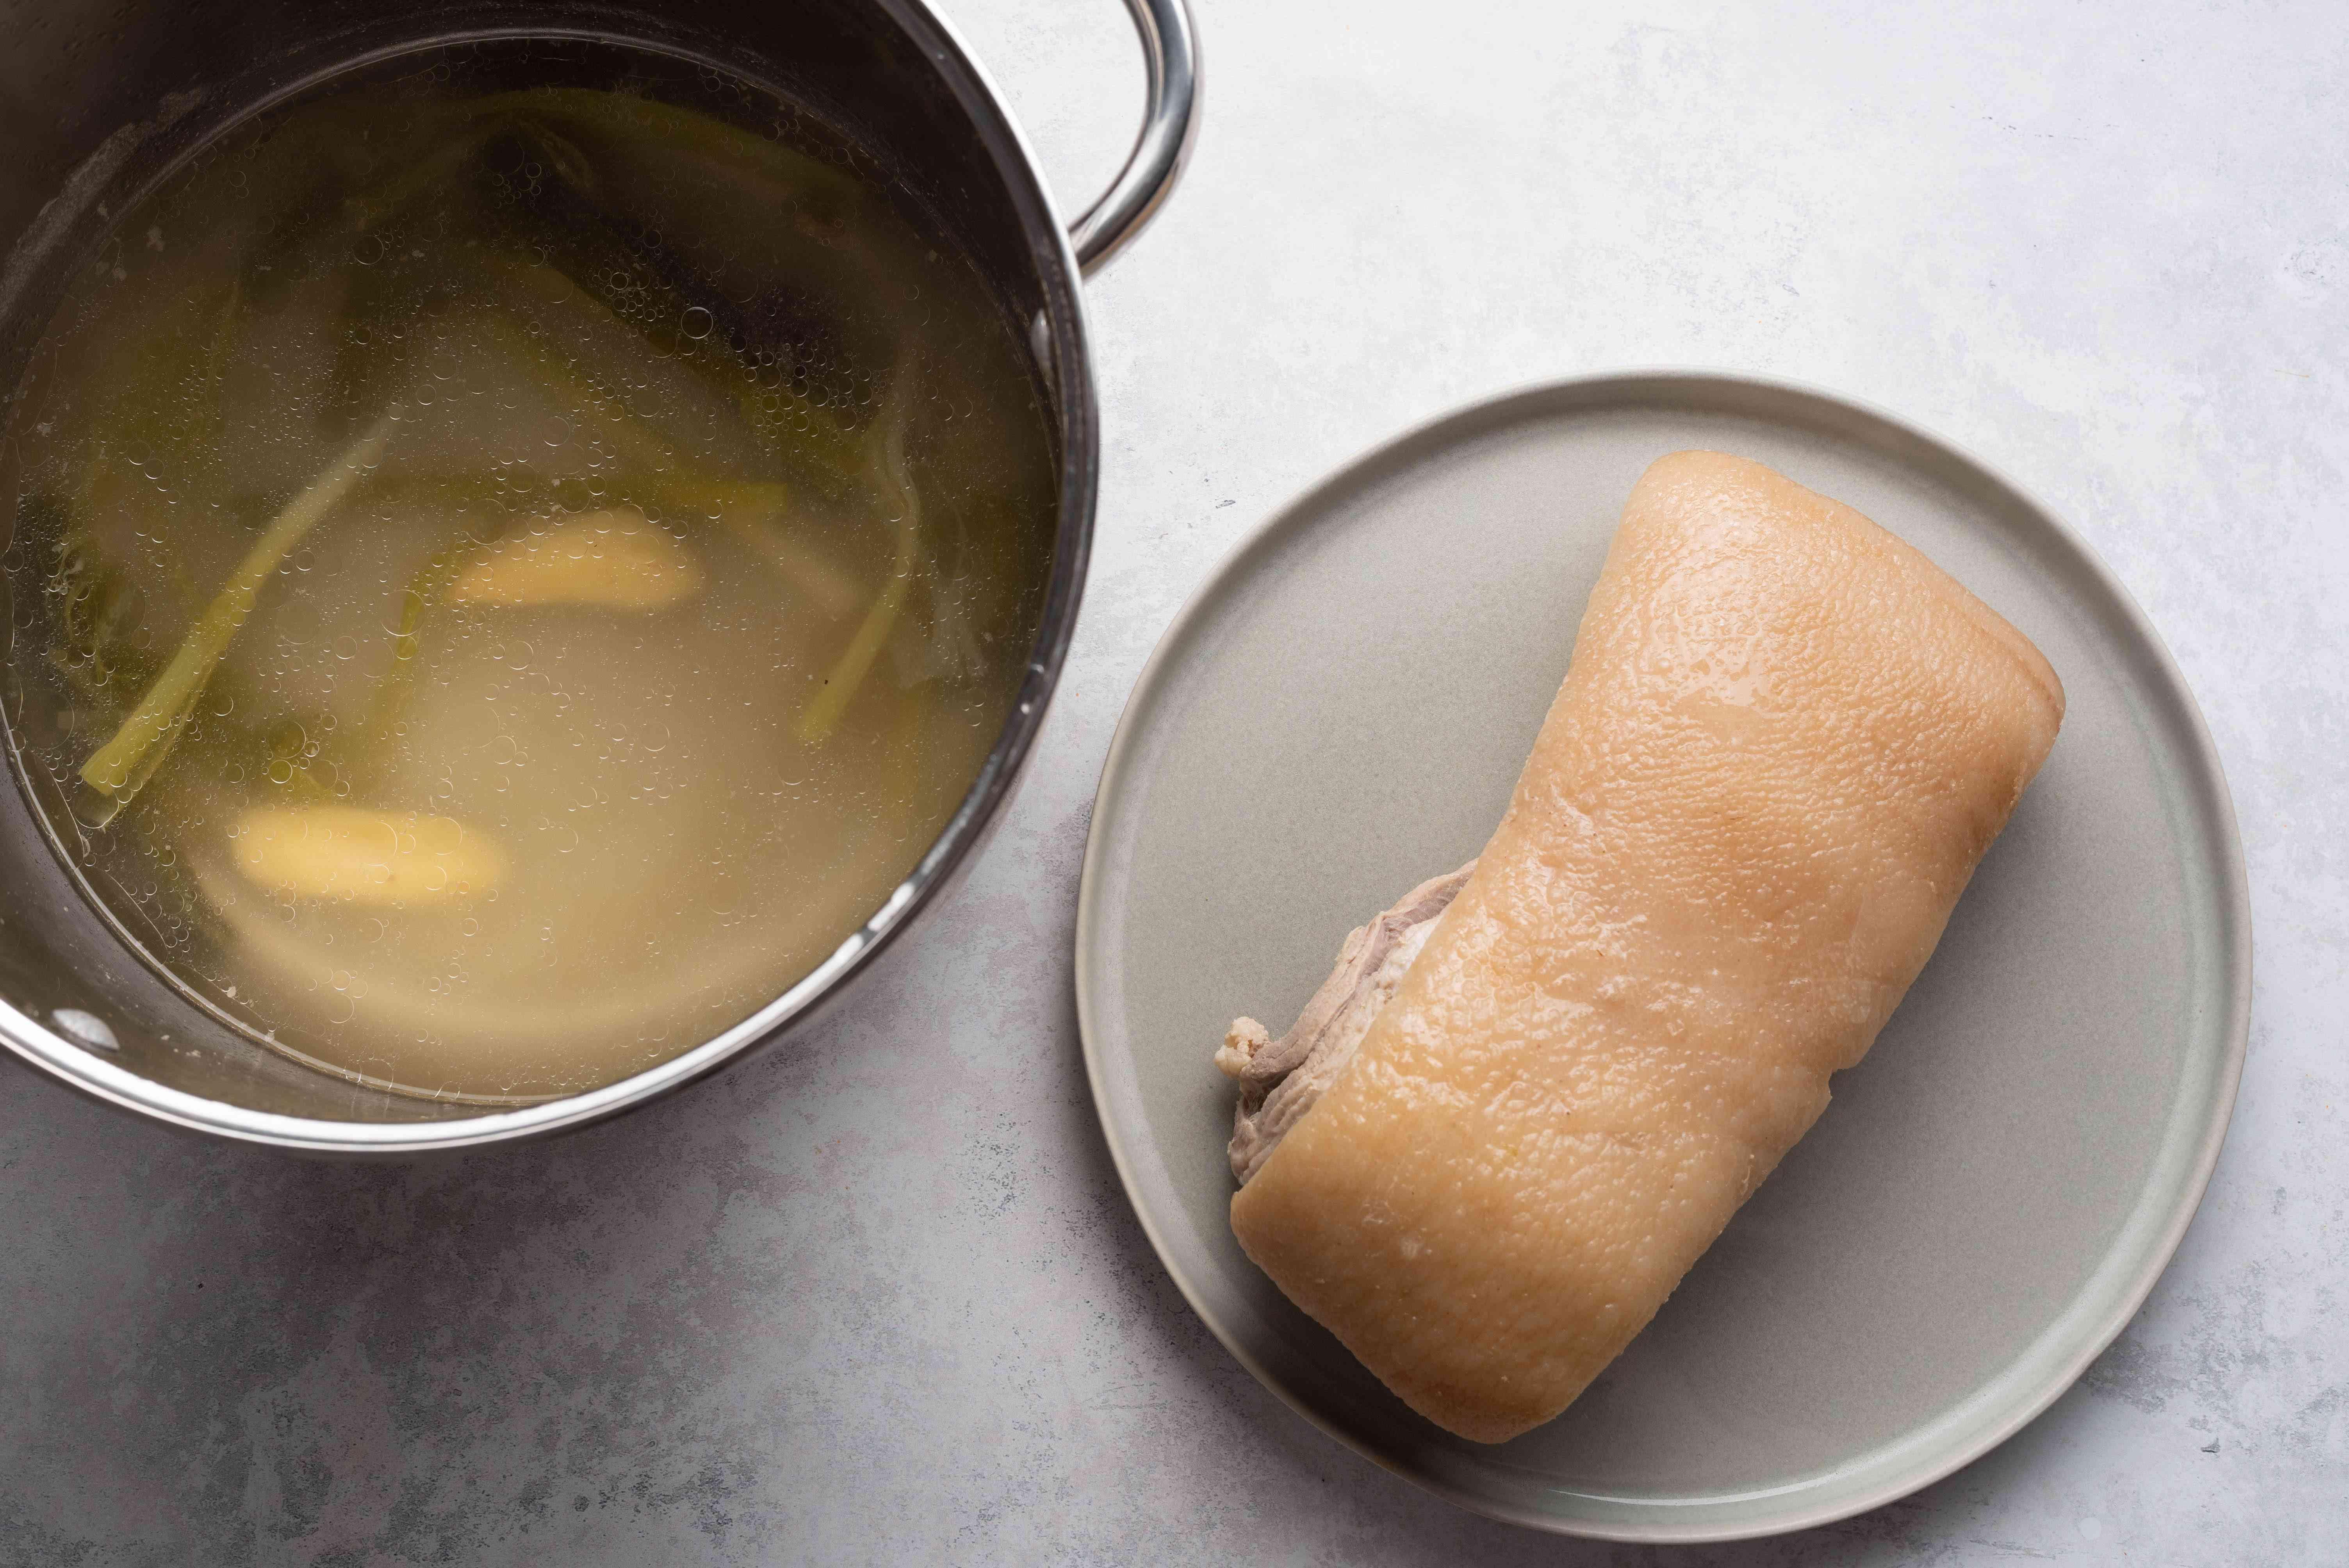 pork belly boiled, resting on plate, stock in pot